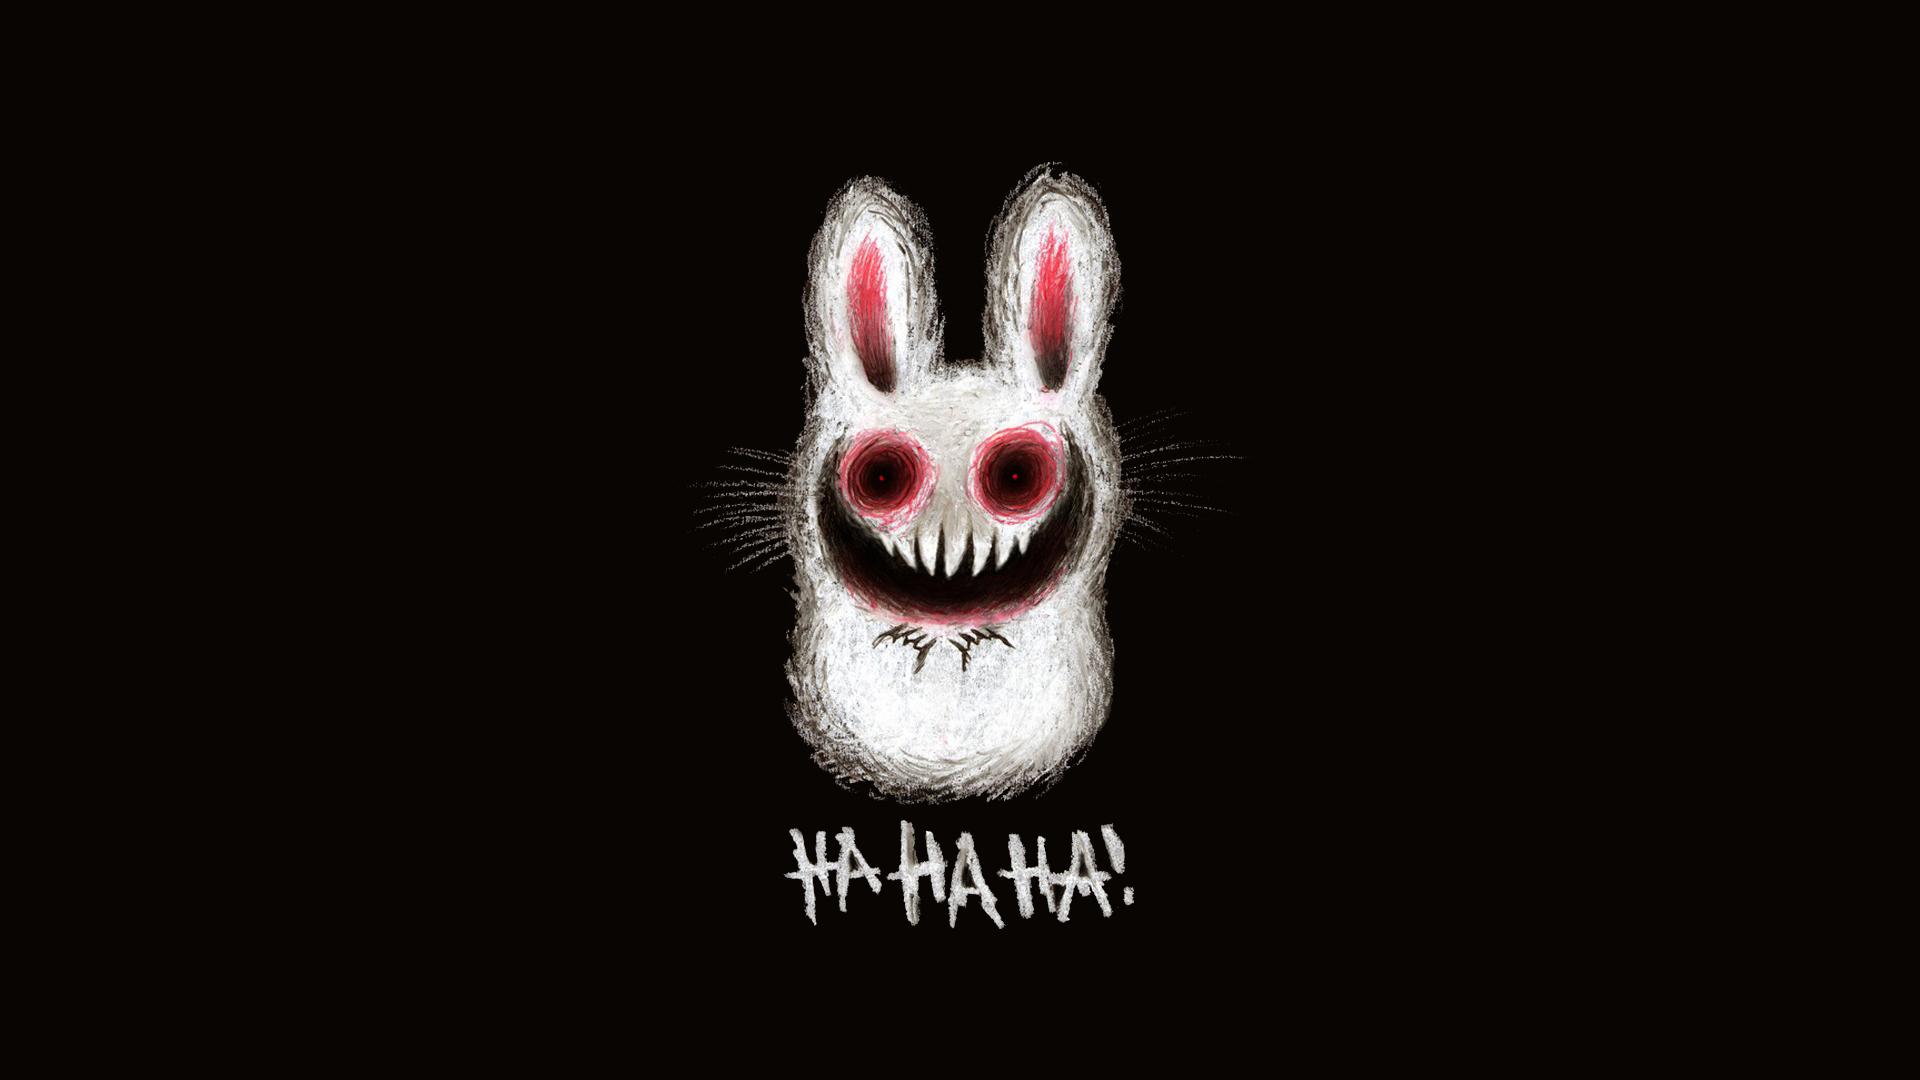 download wallpaper: Halloween konijntje wallpaper